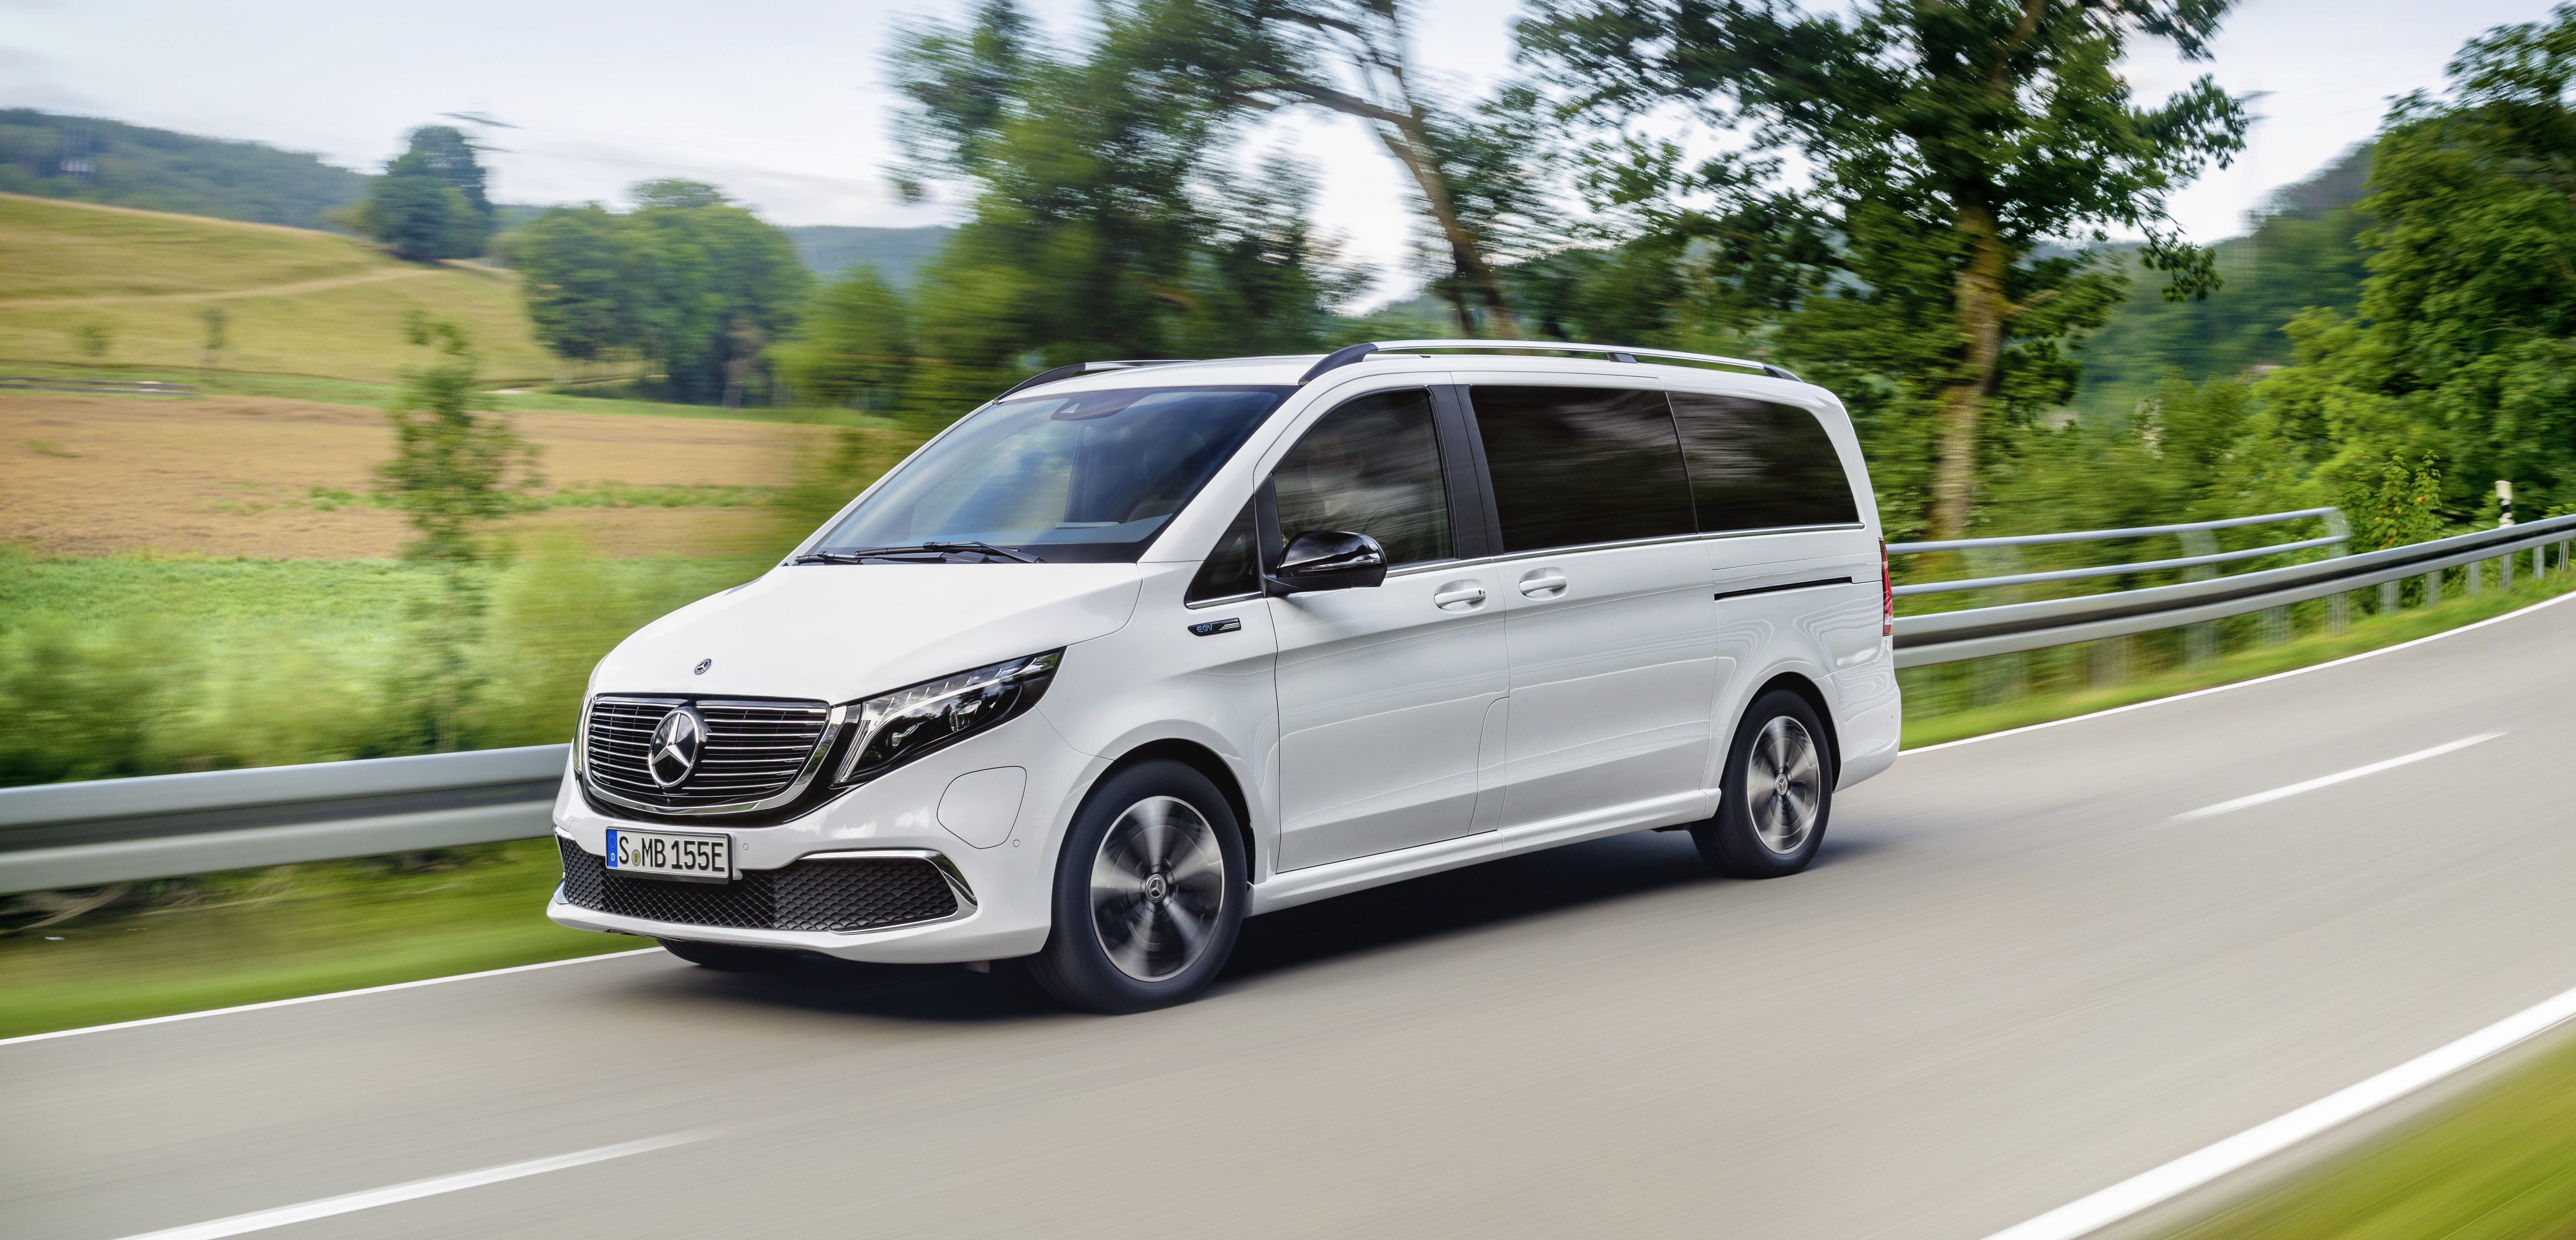 Mercedes Benz Unveils All Electric Mpv Van With 250 Miles Of Range Electrek